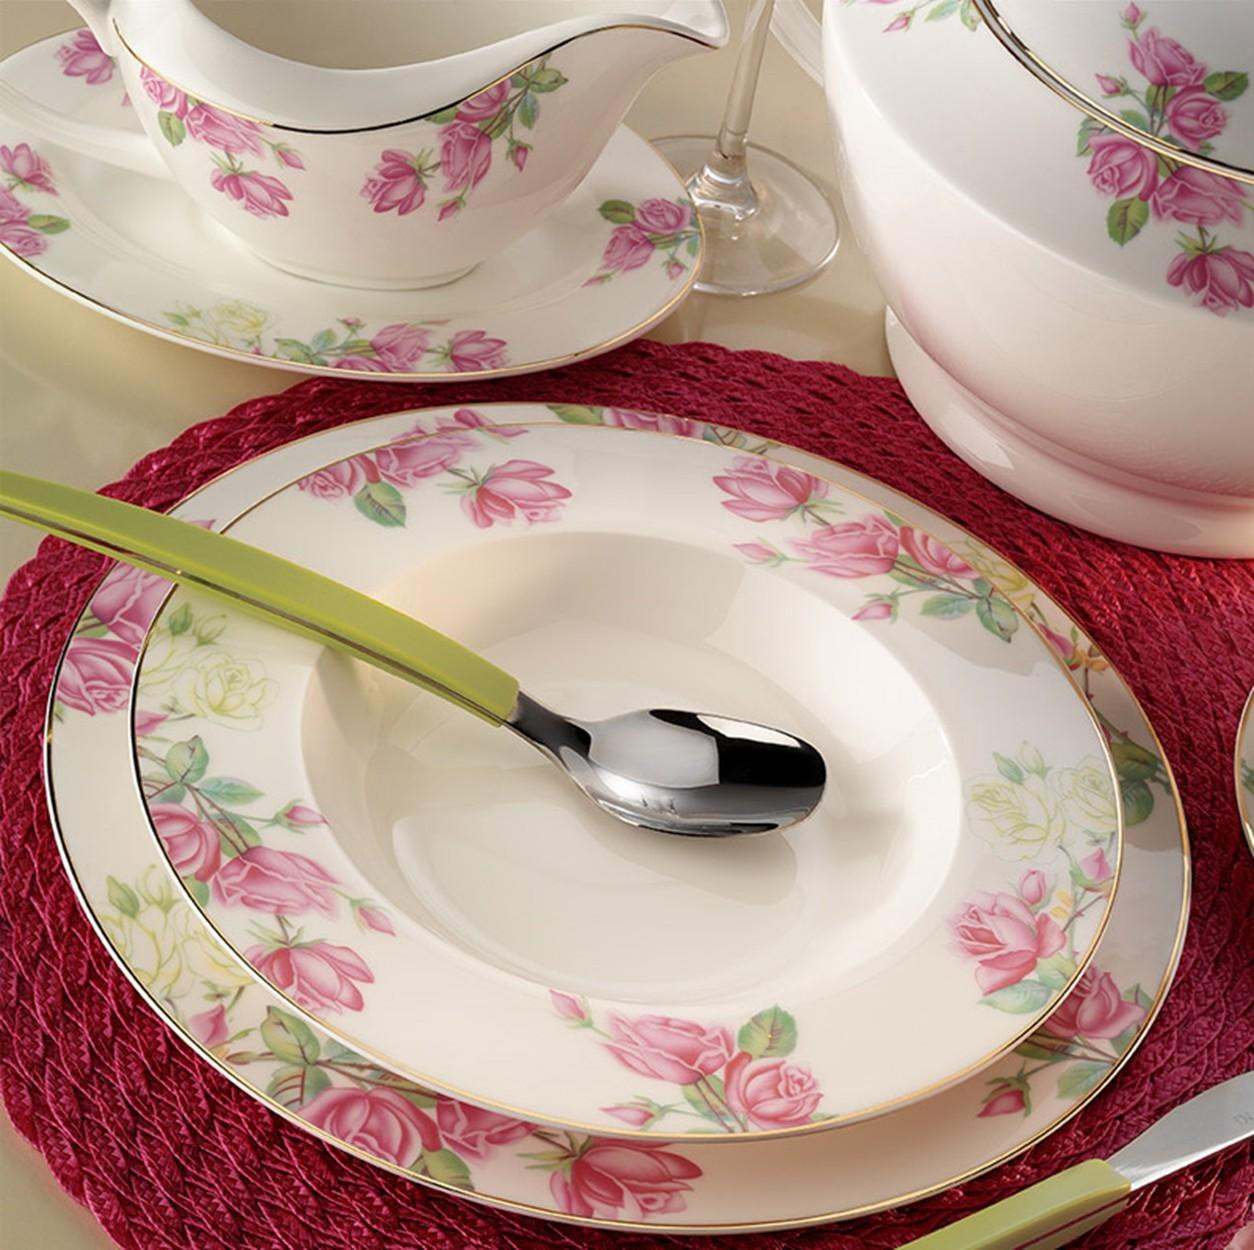 Kutahya Porselen BONE CHINA 84 Pieces 25139 Patterned Dinnerware Set